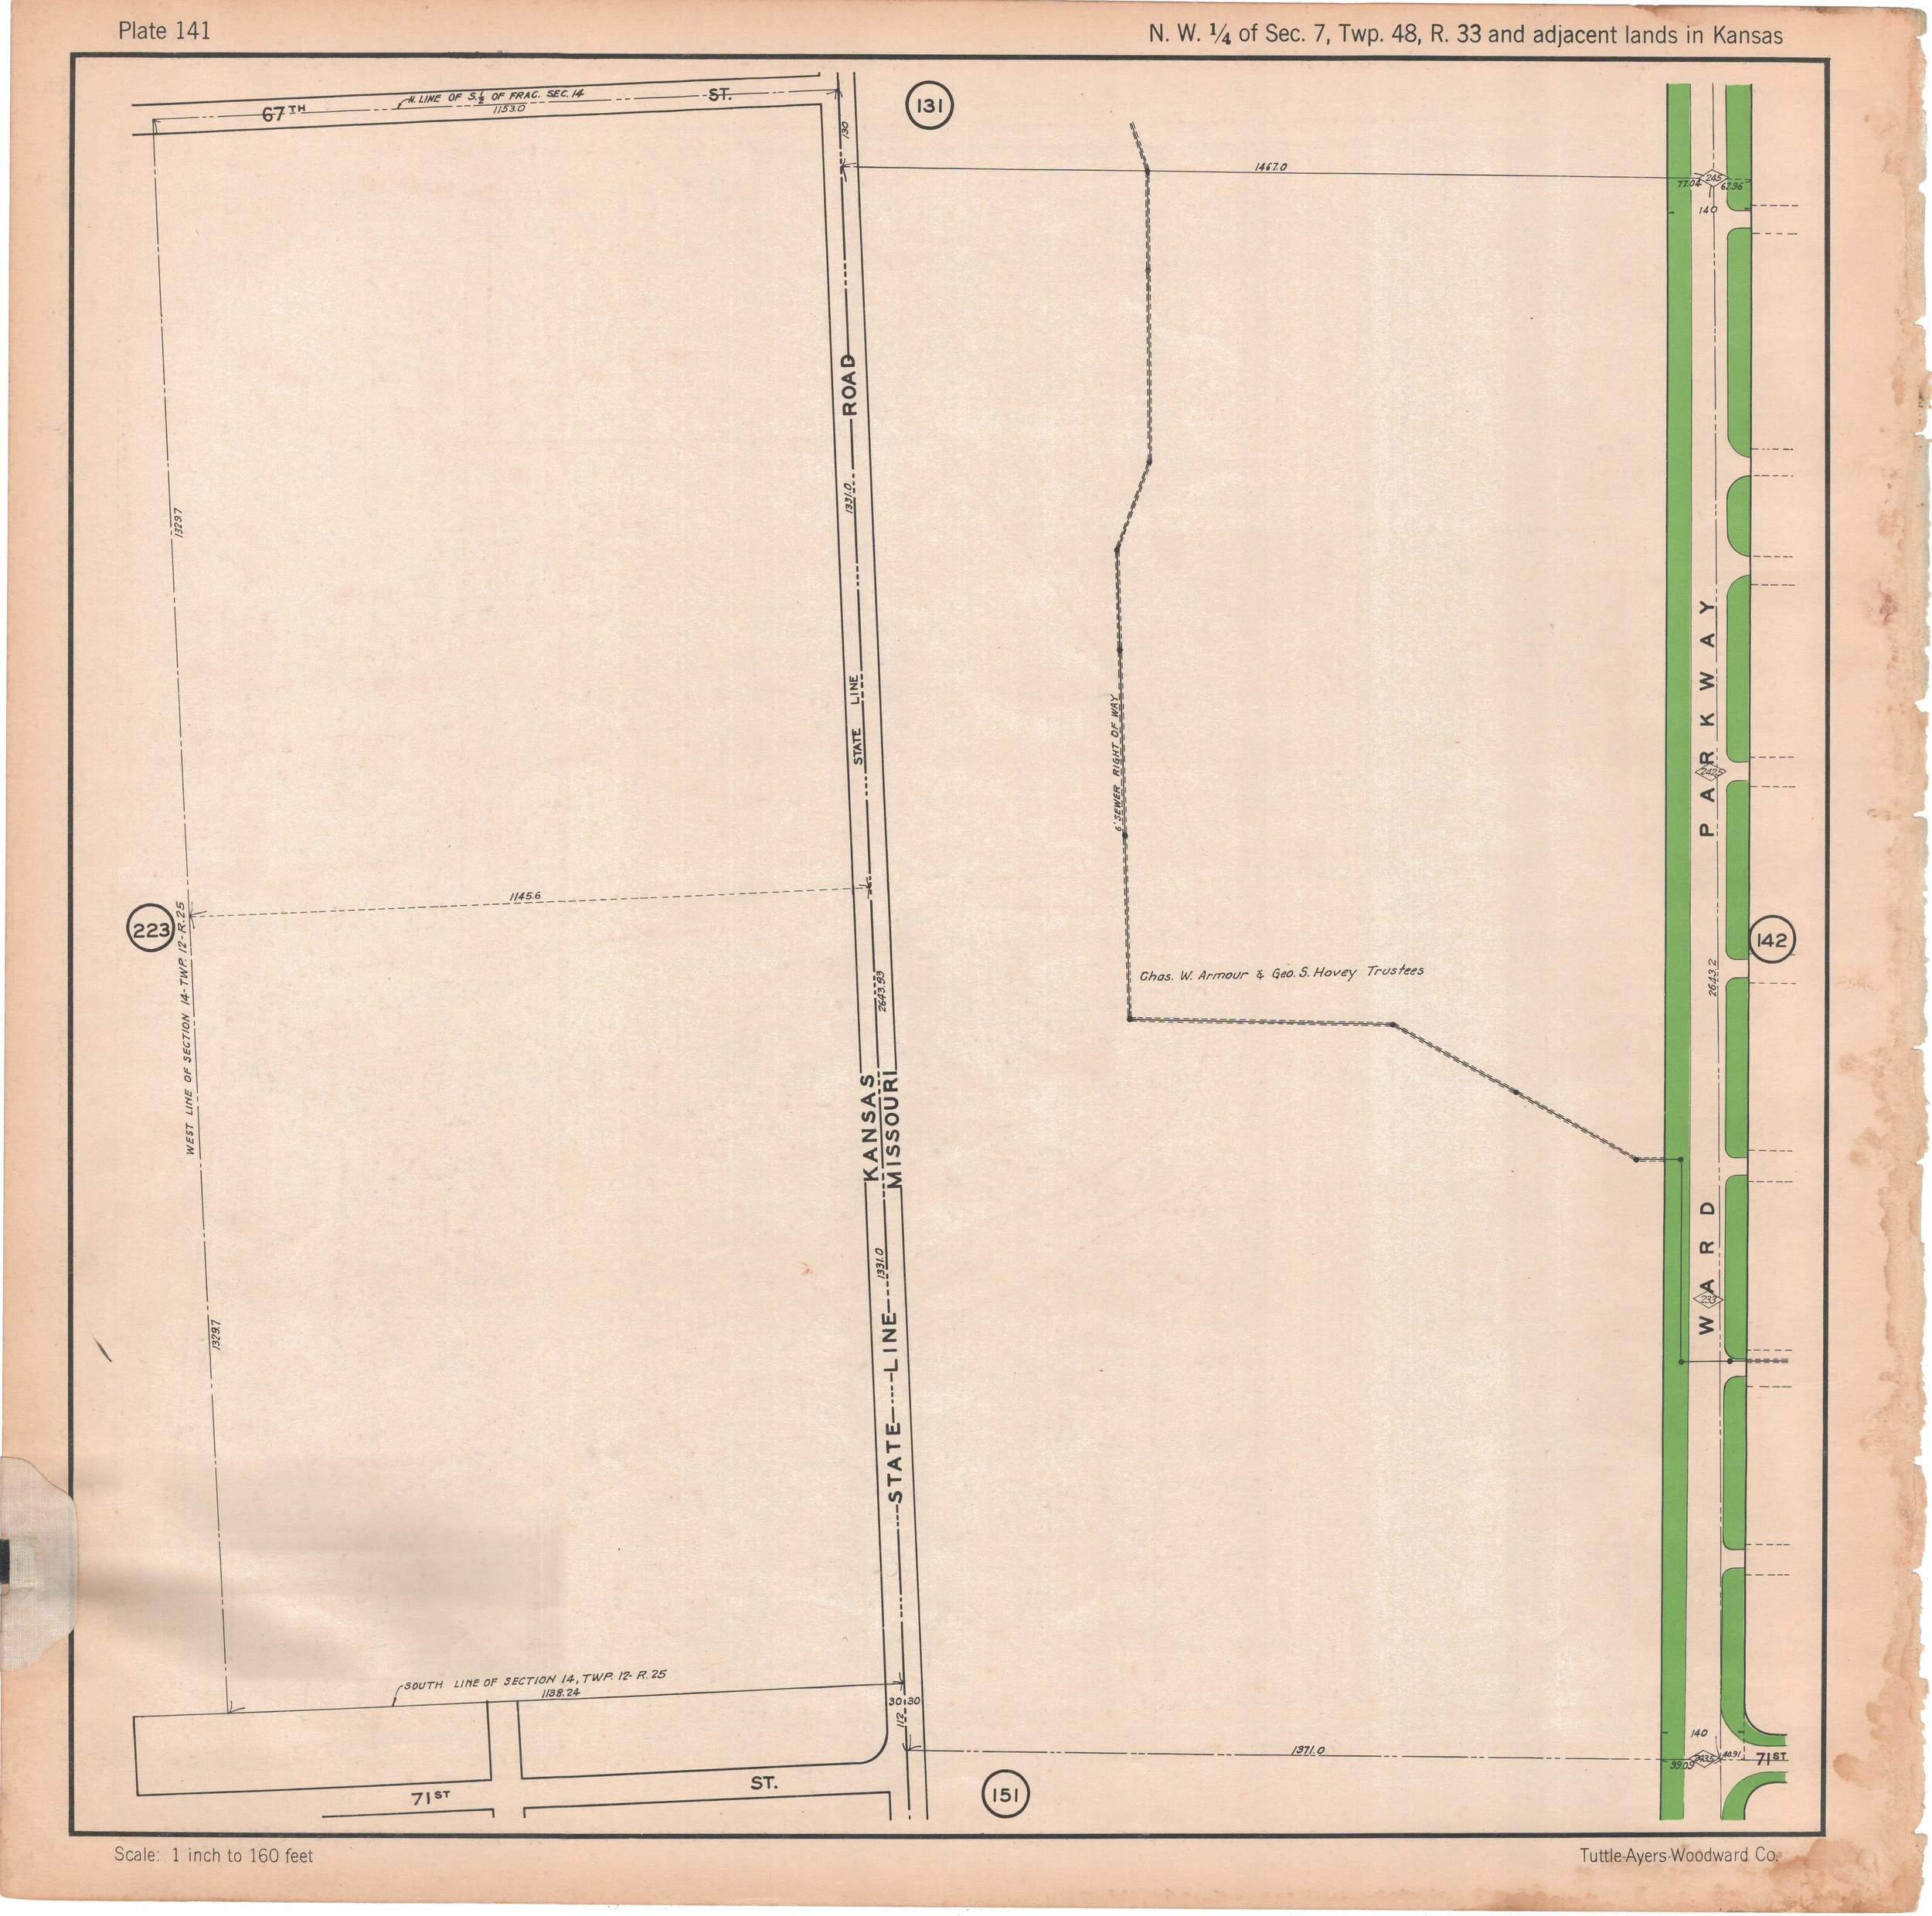 1925 TUTTLE_AYERS_Plate_141.JPG